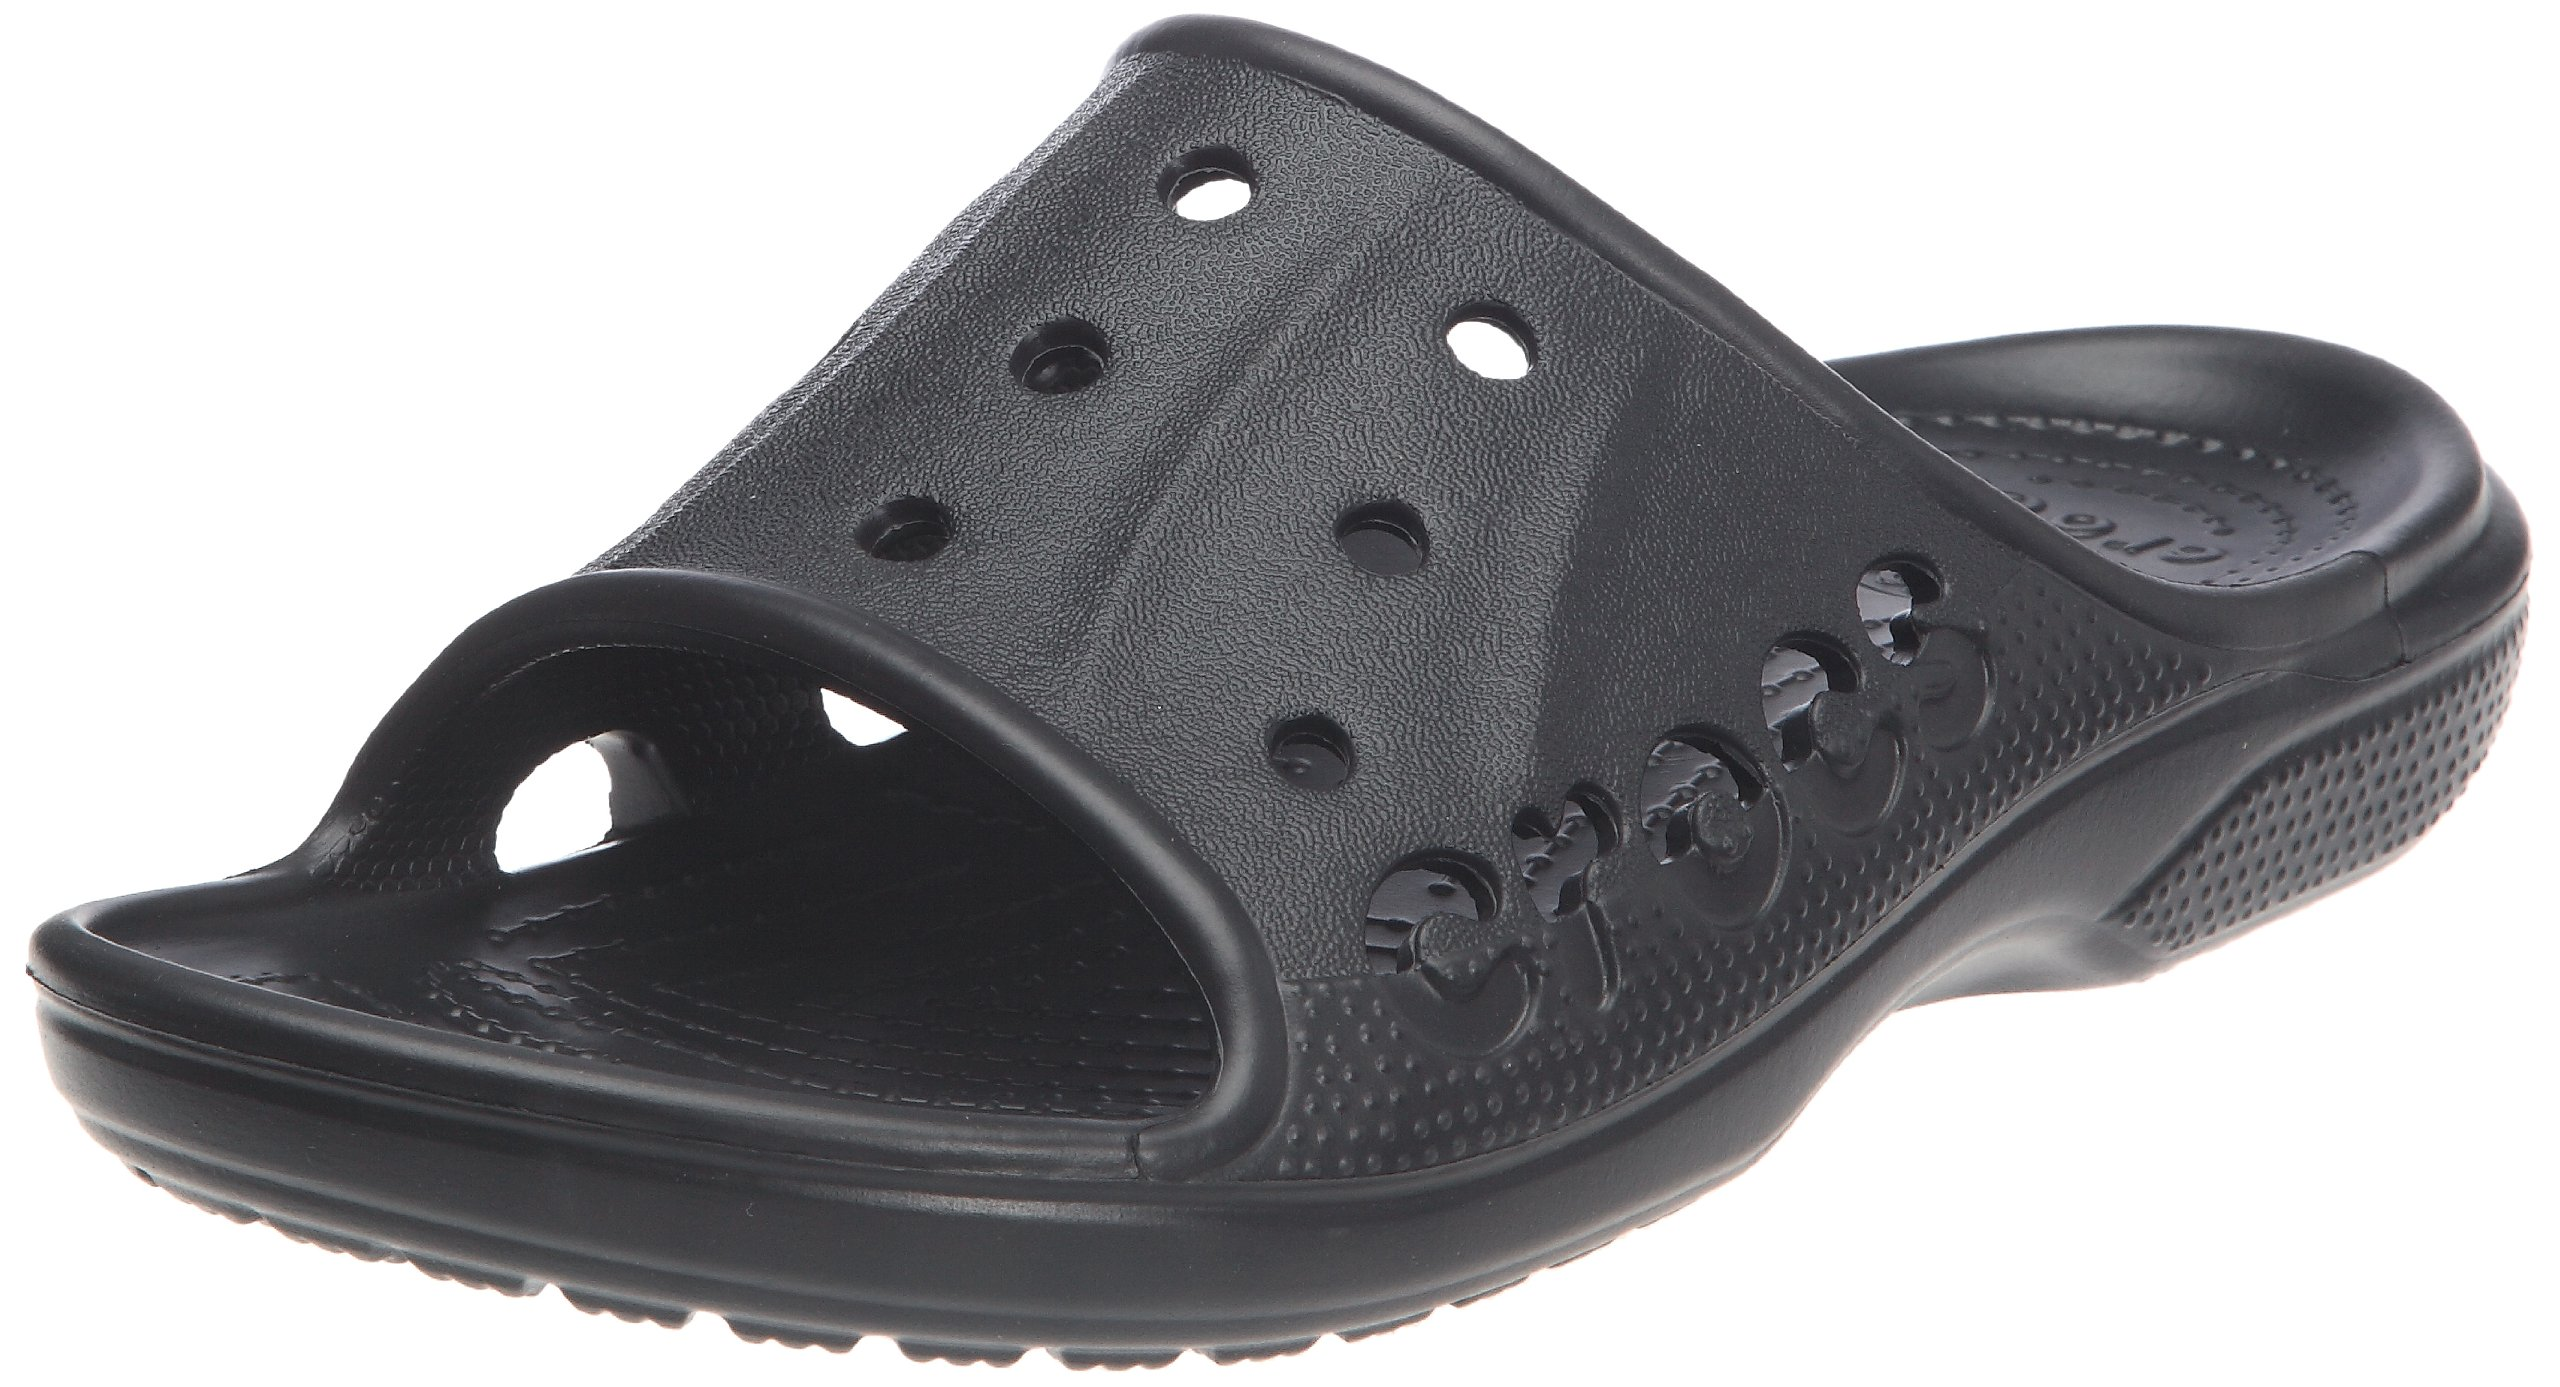 Crocs Unisex Baya Slide,Black,10 M US Men/12 M US Women